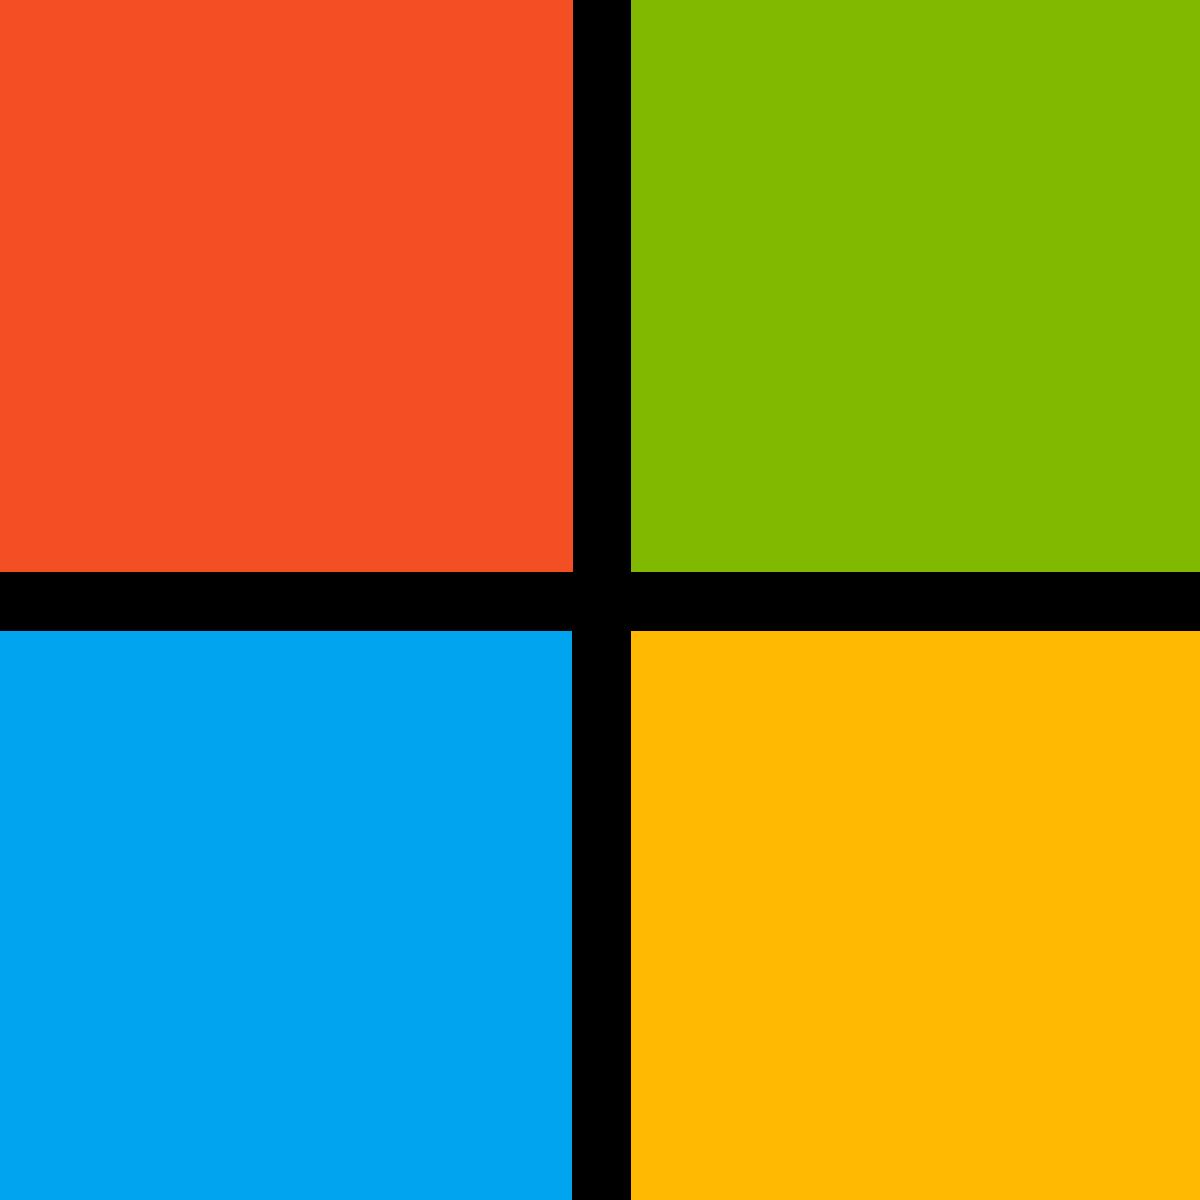 Microsoft_box.png